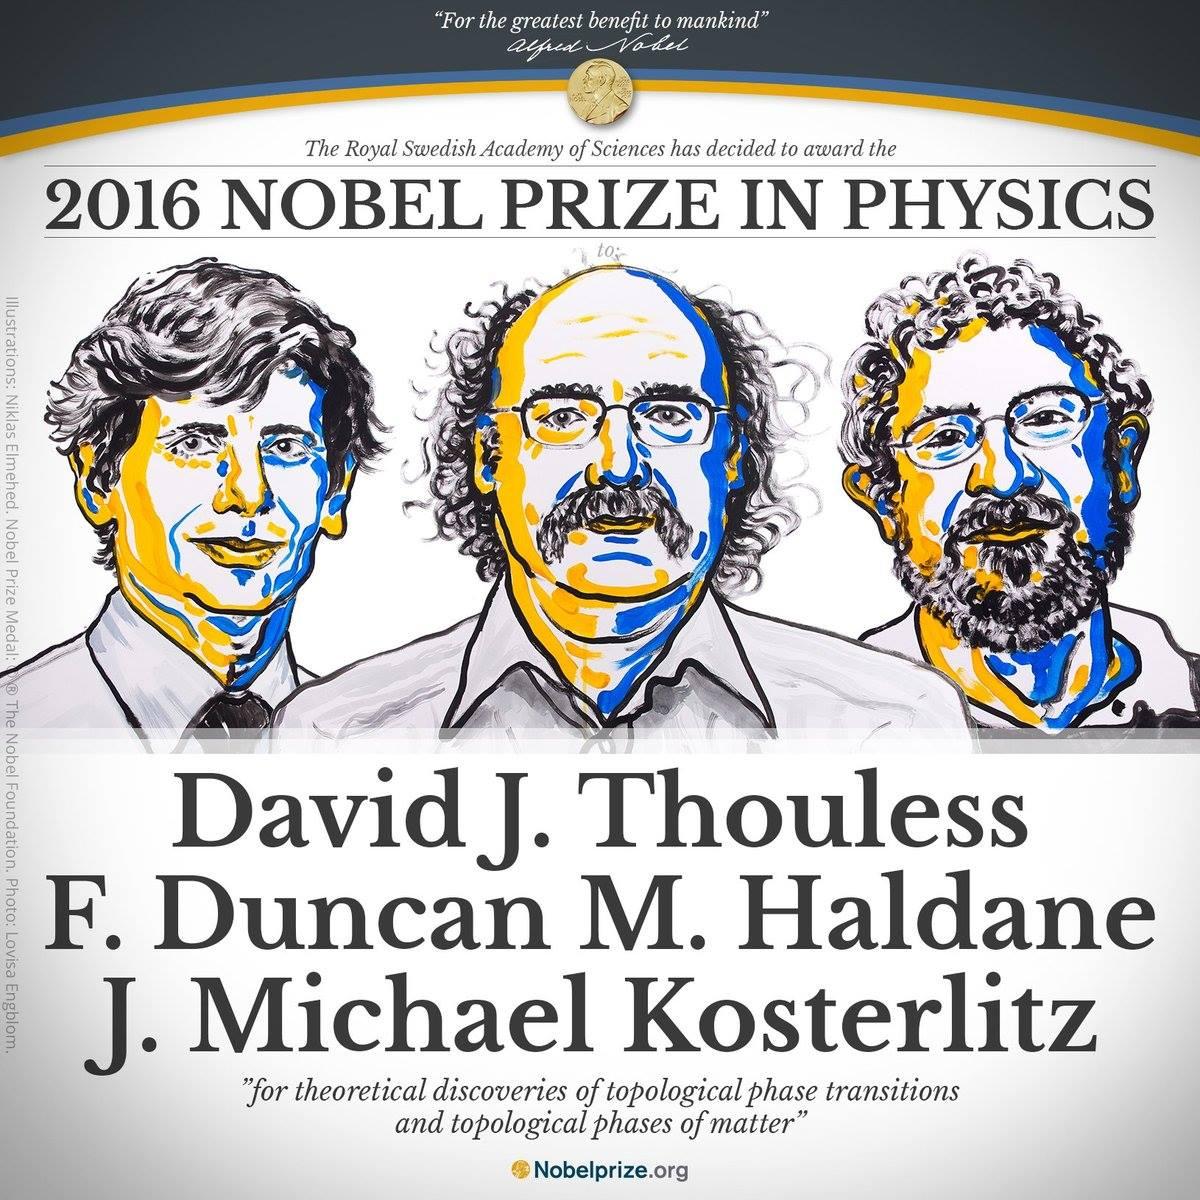 Physics Nobel 2016: David Thouless, F Duncan M Haldane and Michael Kosterlitz winners